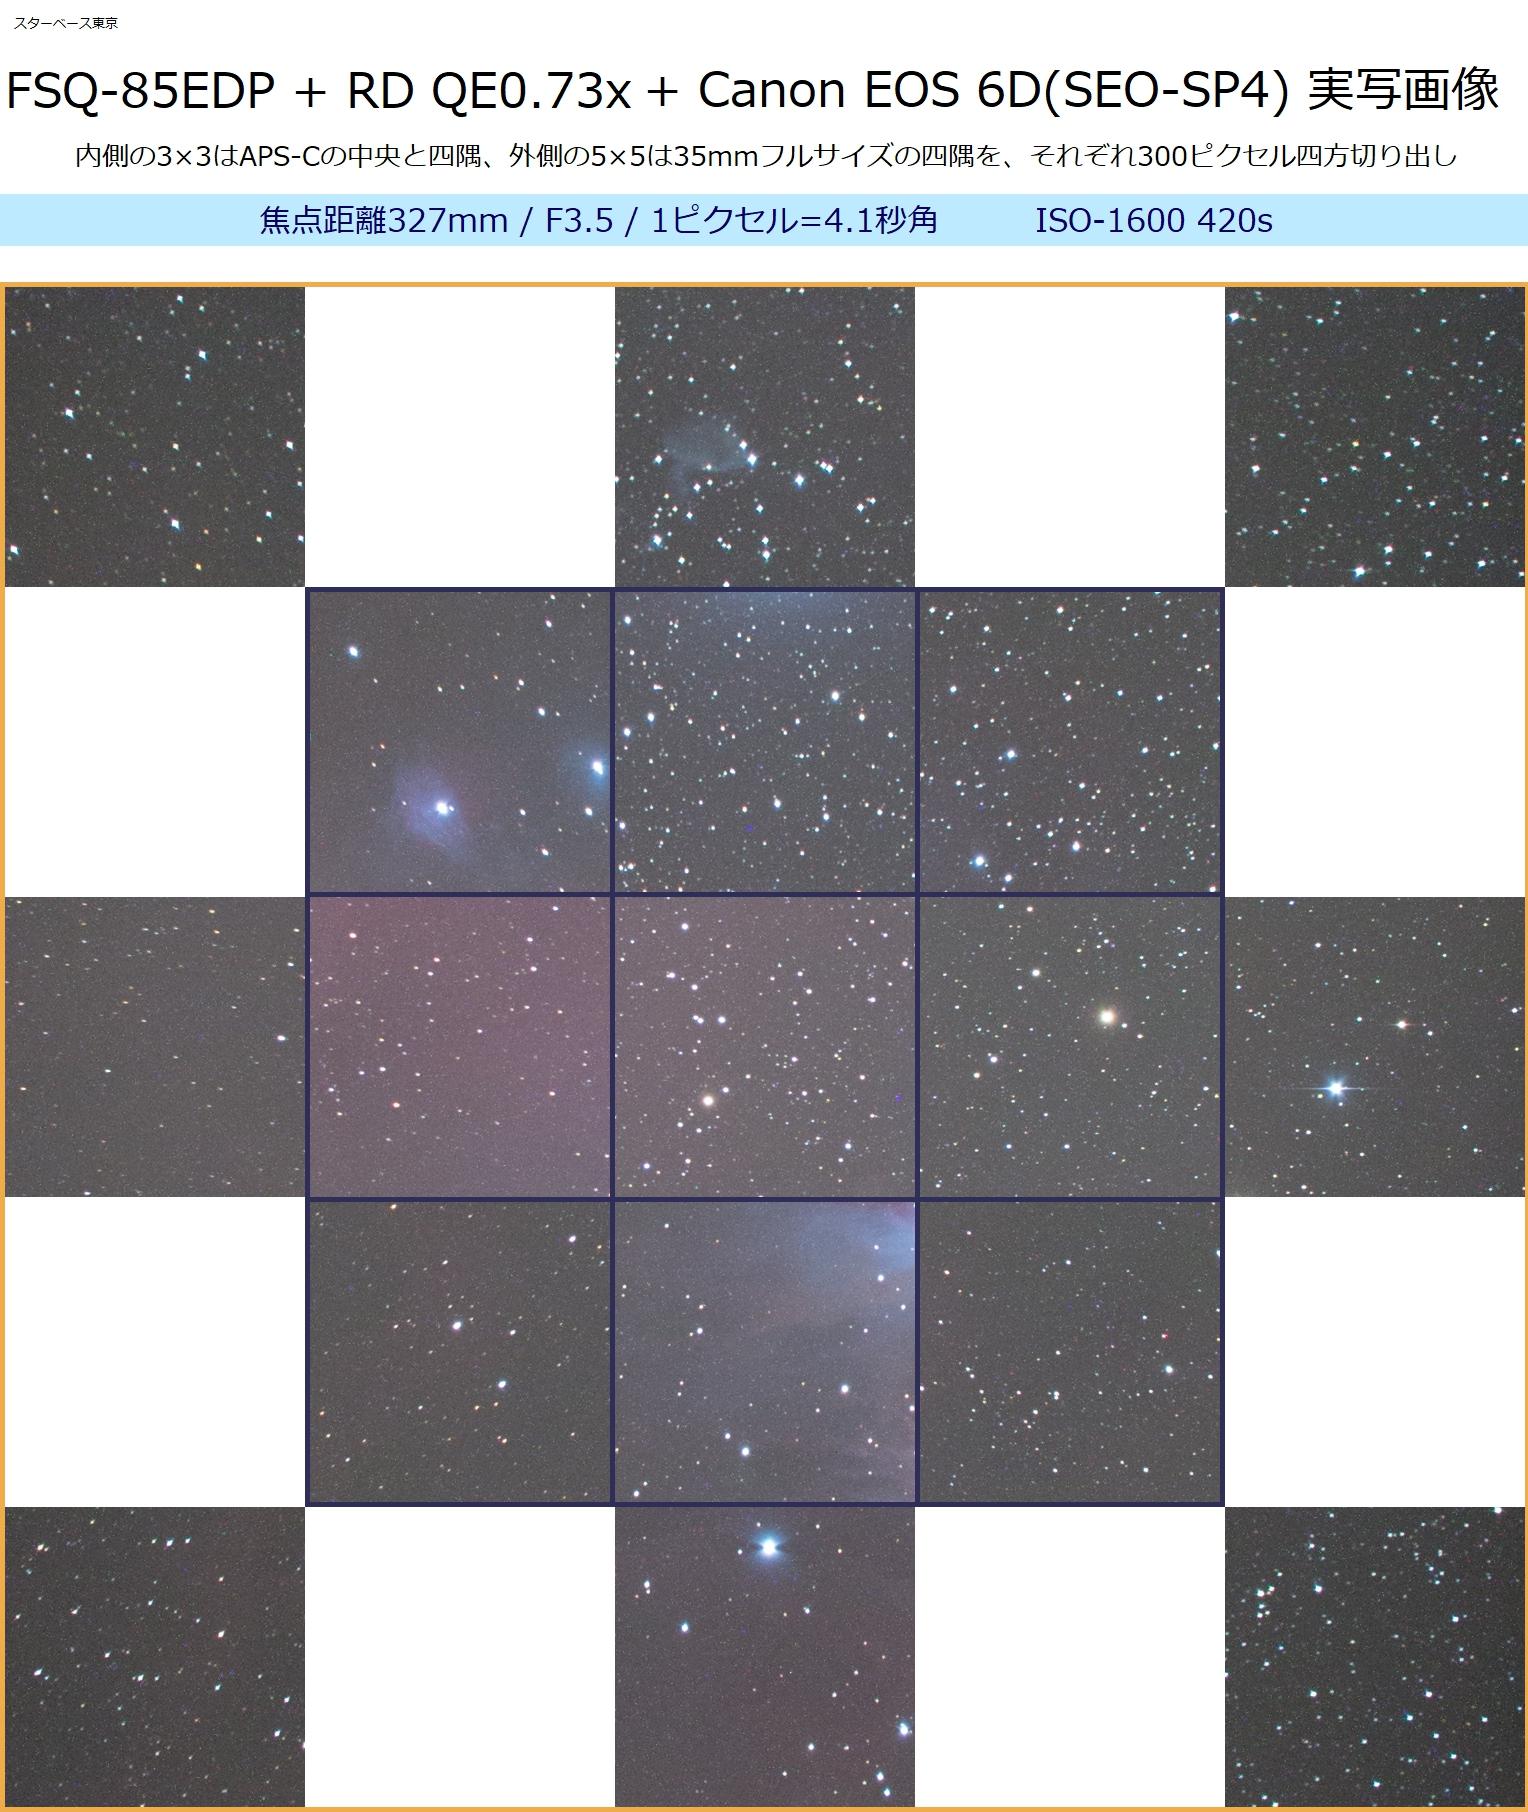 f:id:starbase:20180429140311j:plain